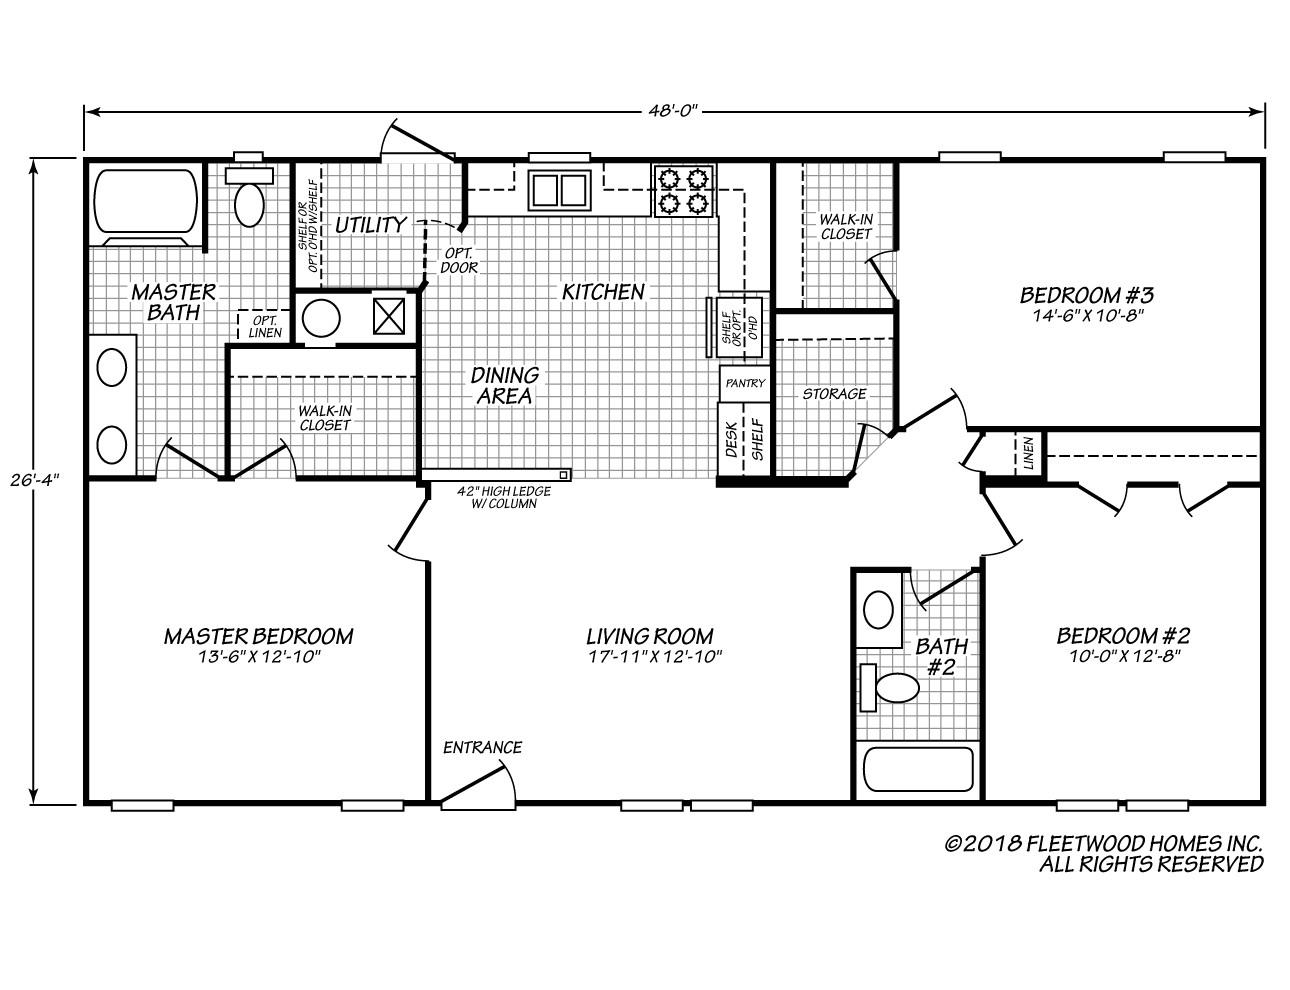 fleetwood single wide mobile homes plans gqthyhs31j59cznldwrpekj2kghv3lmceqxc0cq7lcldevpfufdxlmpe0ypb0hj3o7z4bbtjgktm9fuh1xwgra